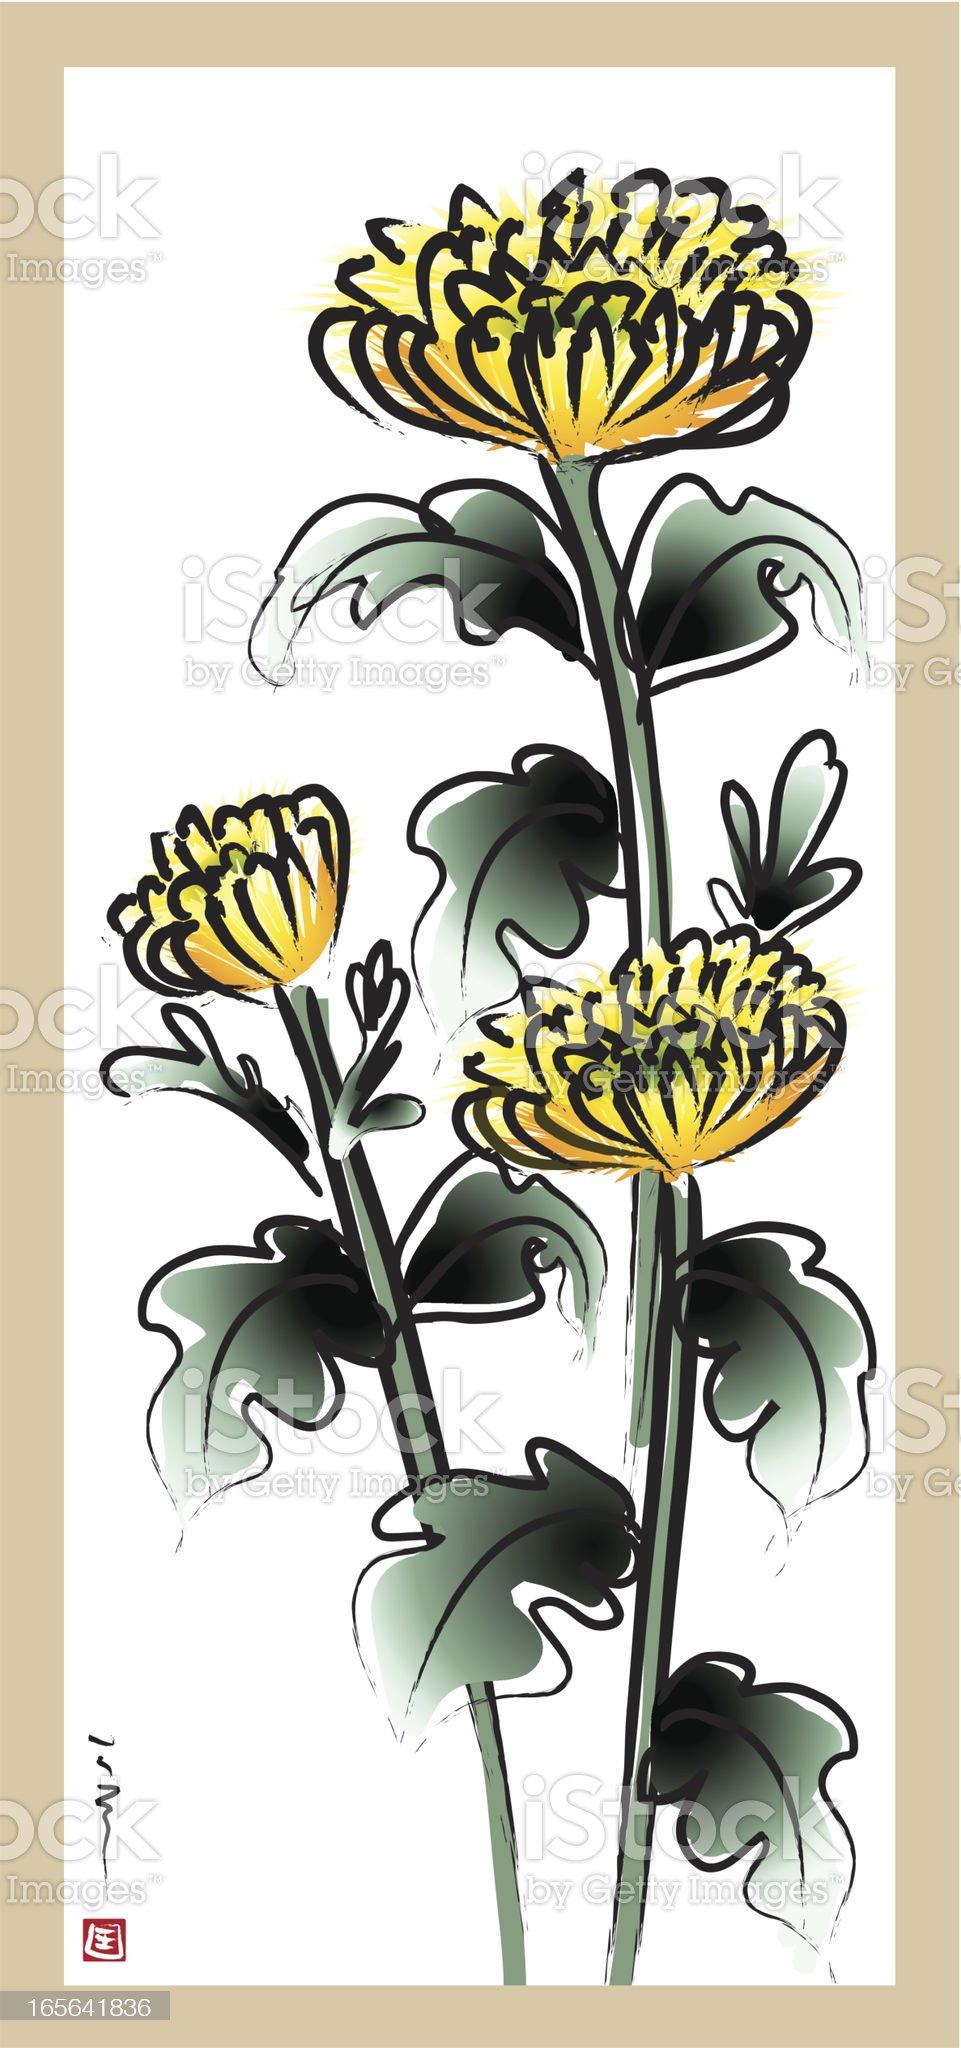 Four Gentlemen of Flowers - chrysanthemum royalty-free stock vector art